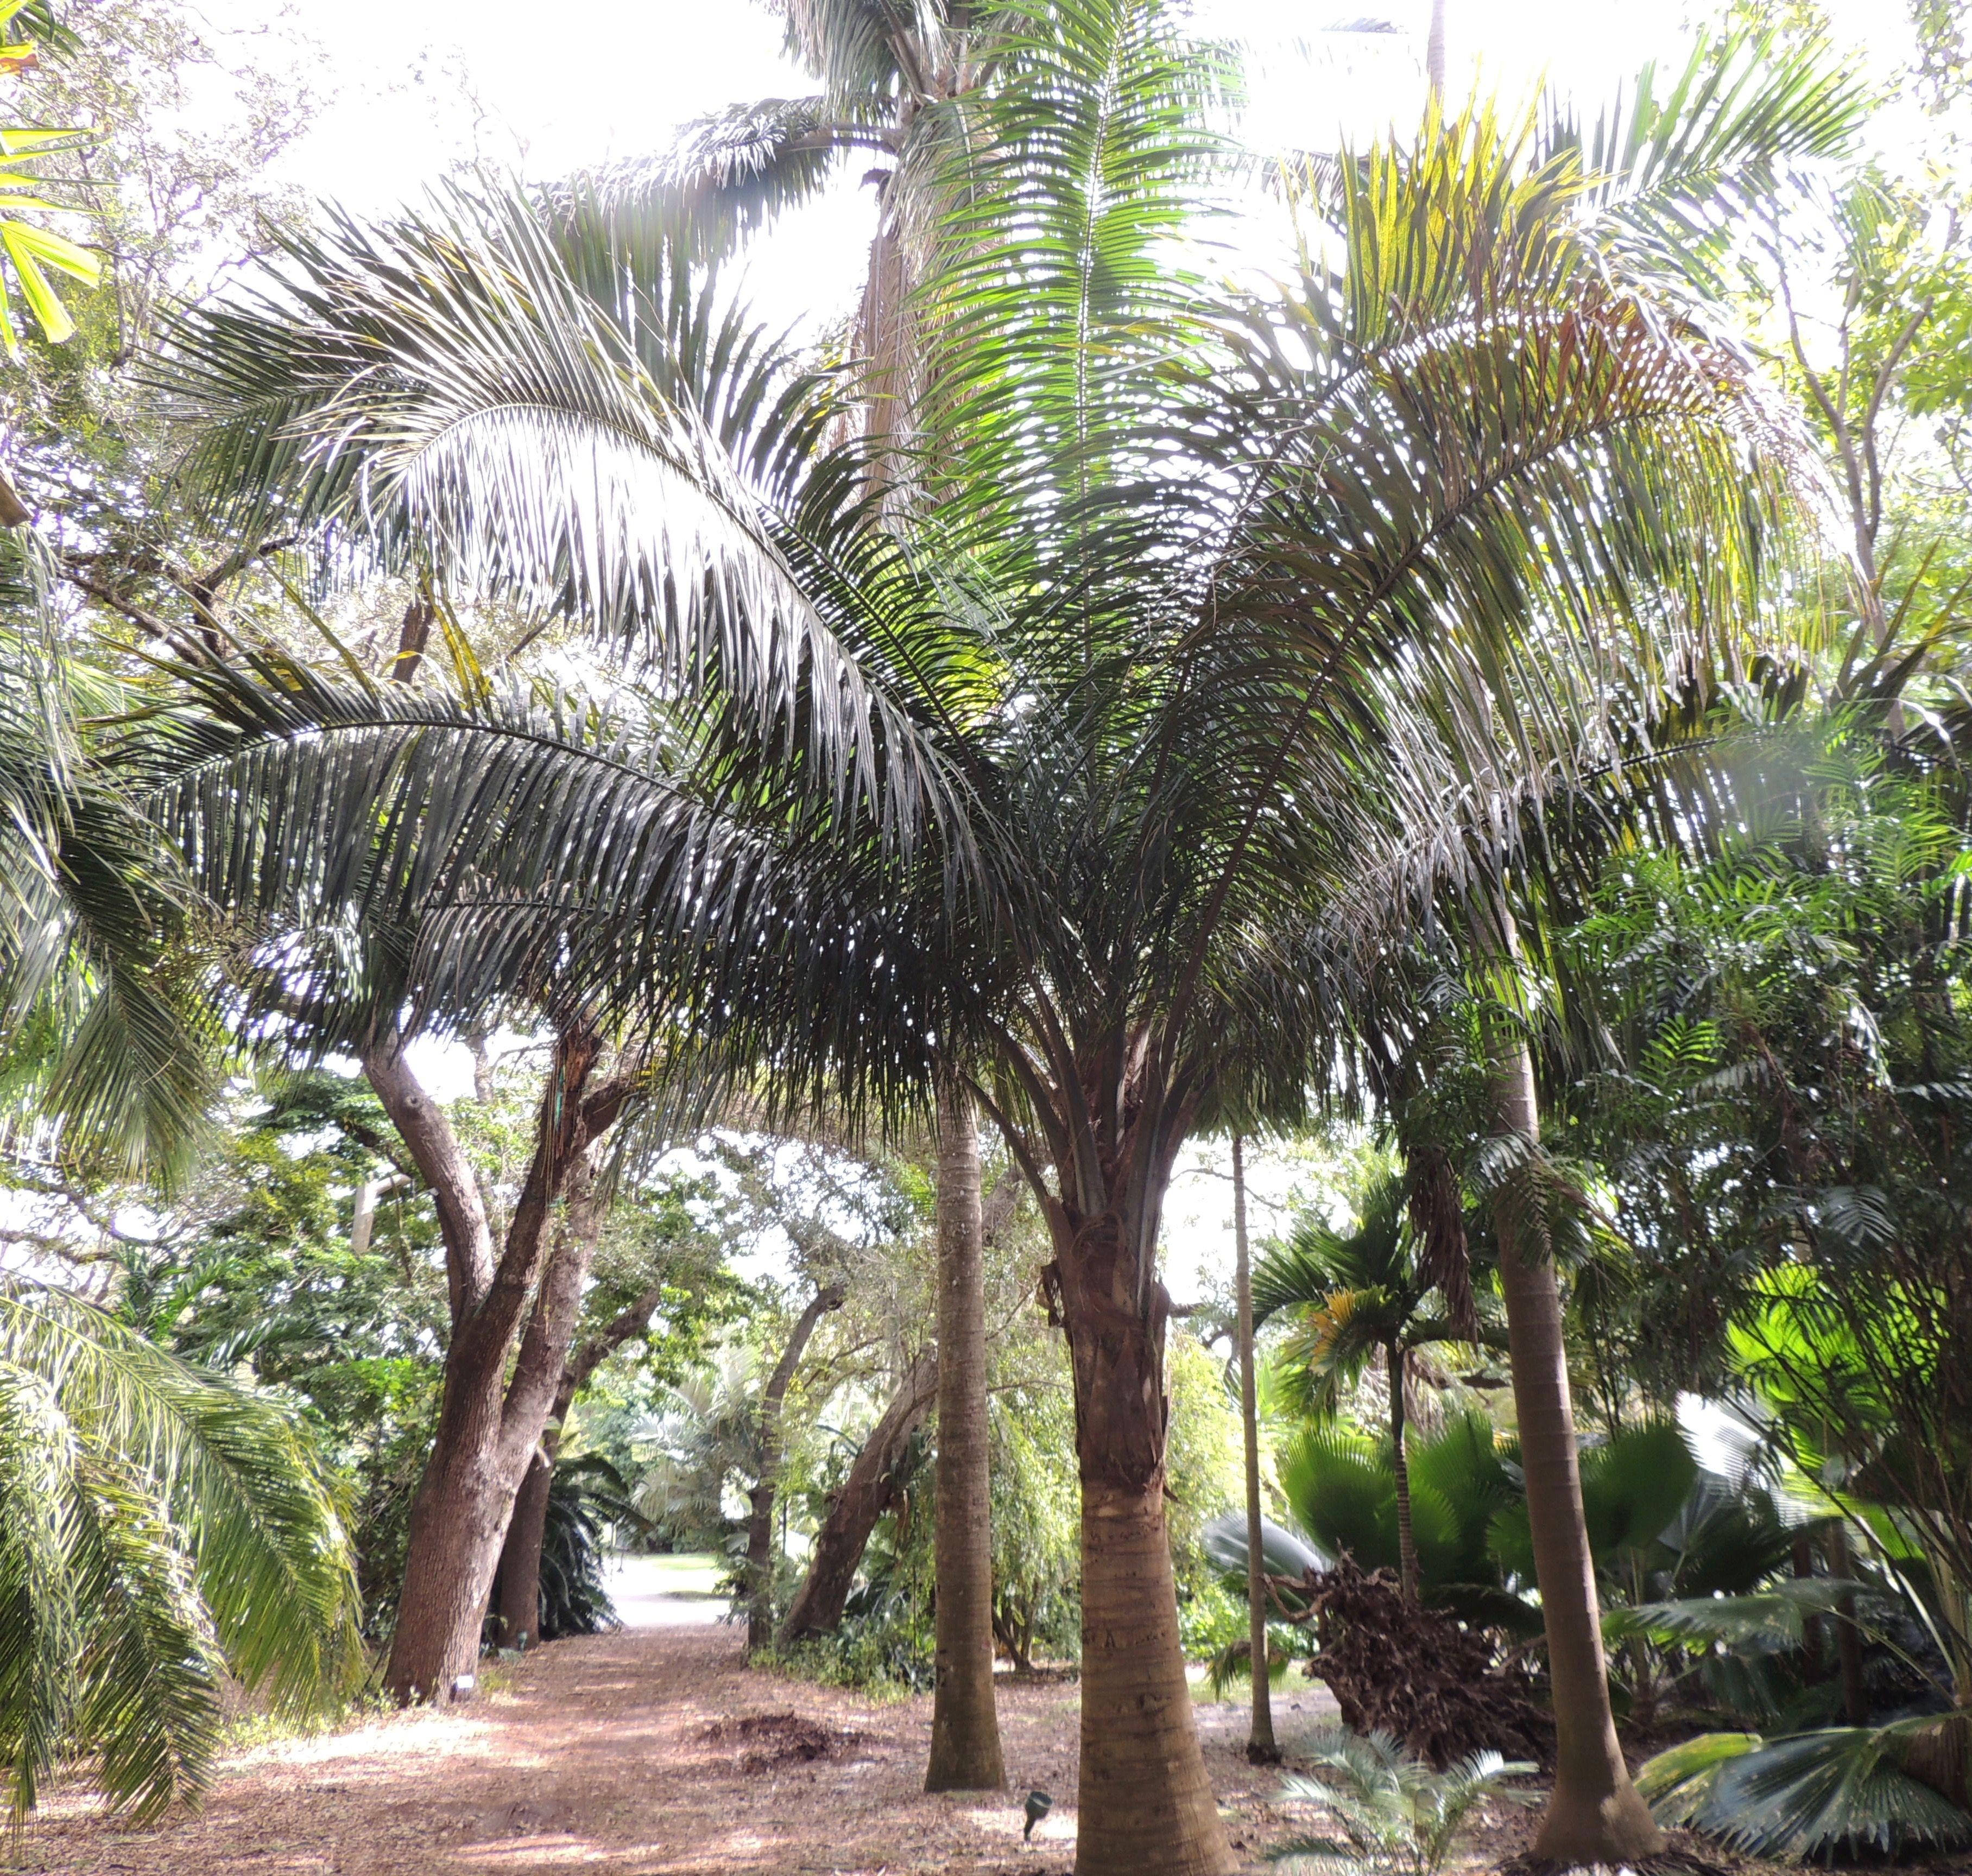 Attalea Crassispatha Fairchild Tropical Gardens, Hawaii